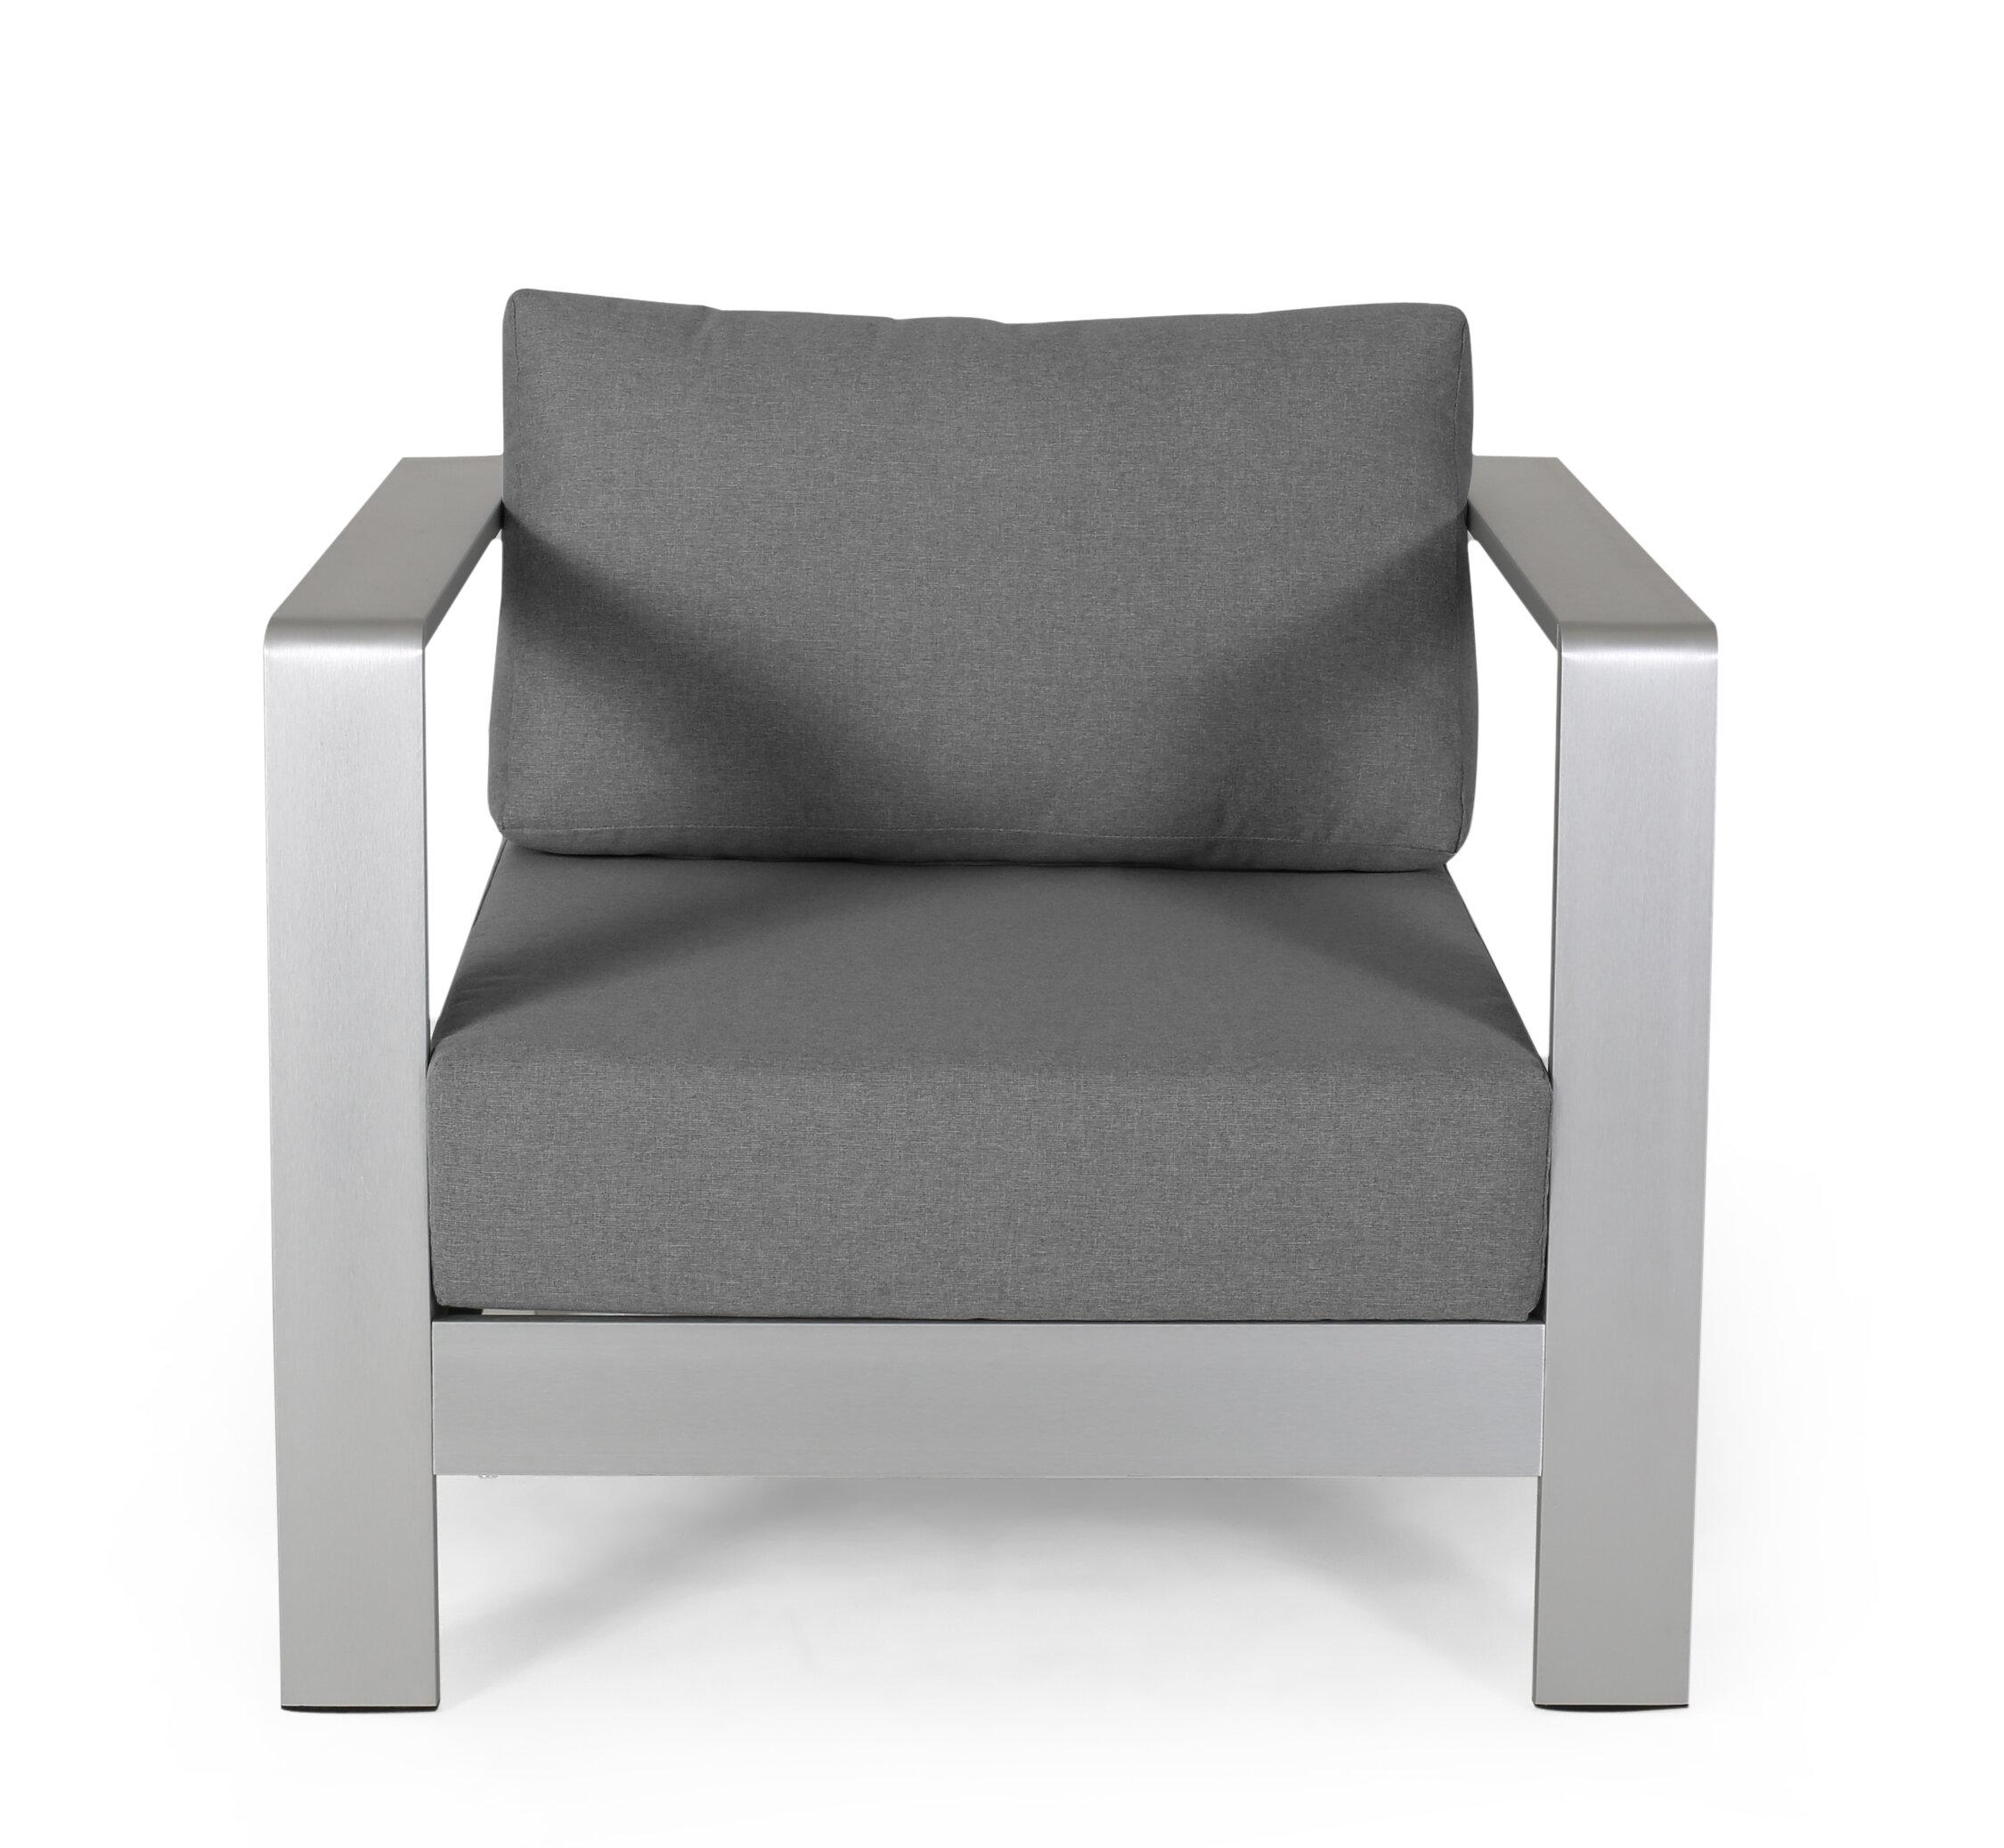 Orren Ellis Wolsingham Outdoor Patio Chair With Cushions Reviews Wayfair